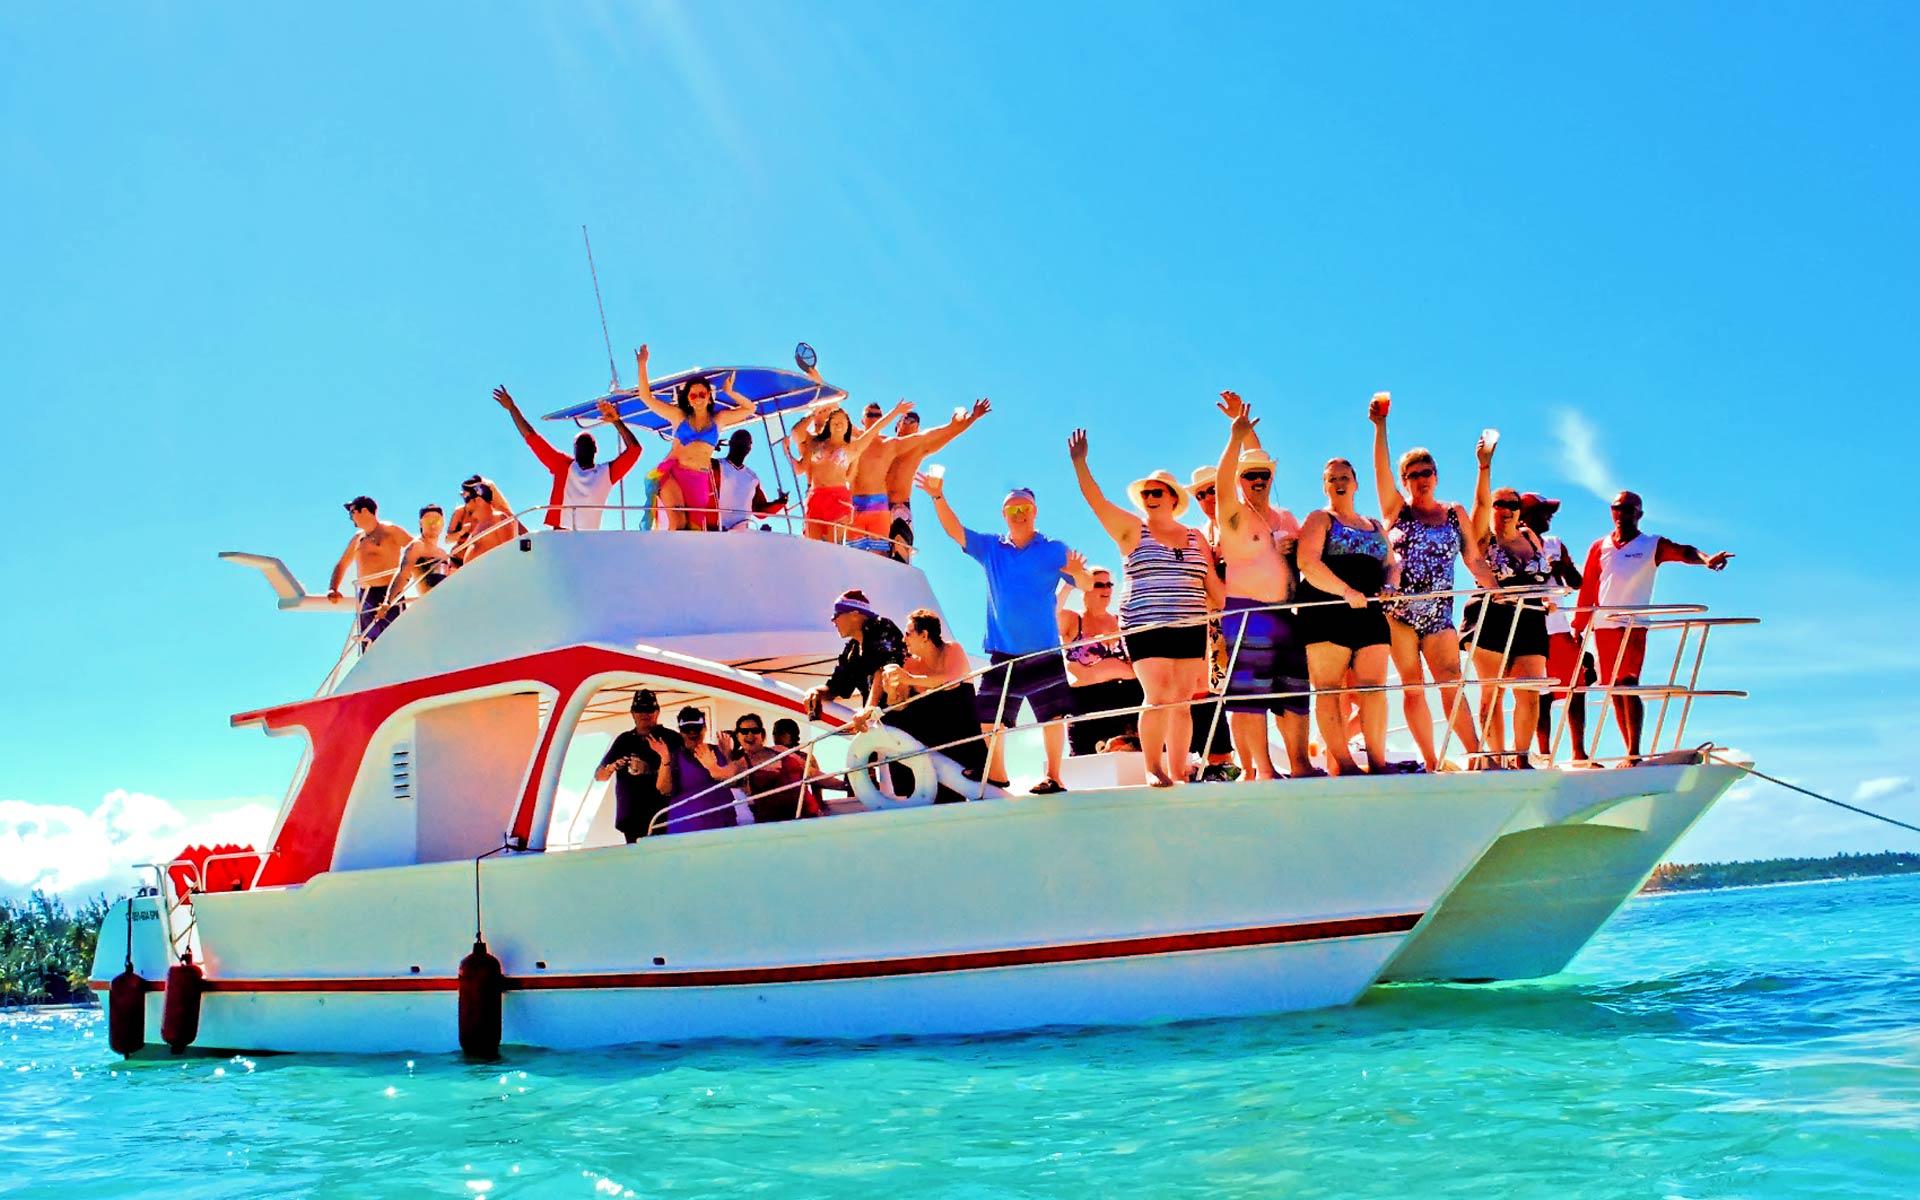 Party-Boat-Tour-Punta-Cana-Excursion-Catamaran.jpg